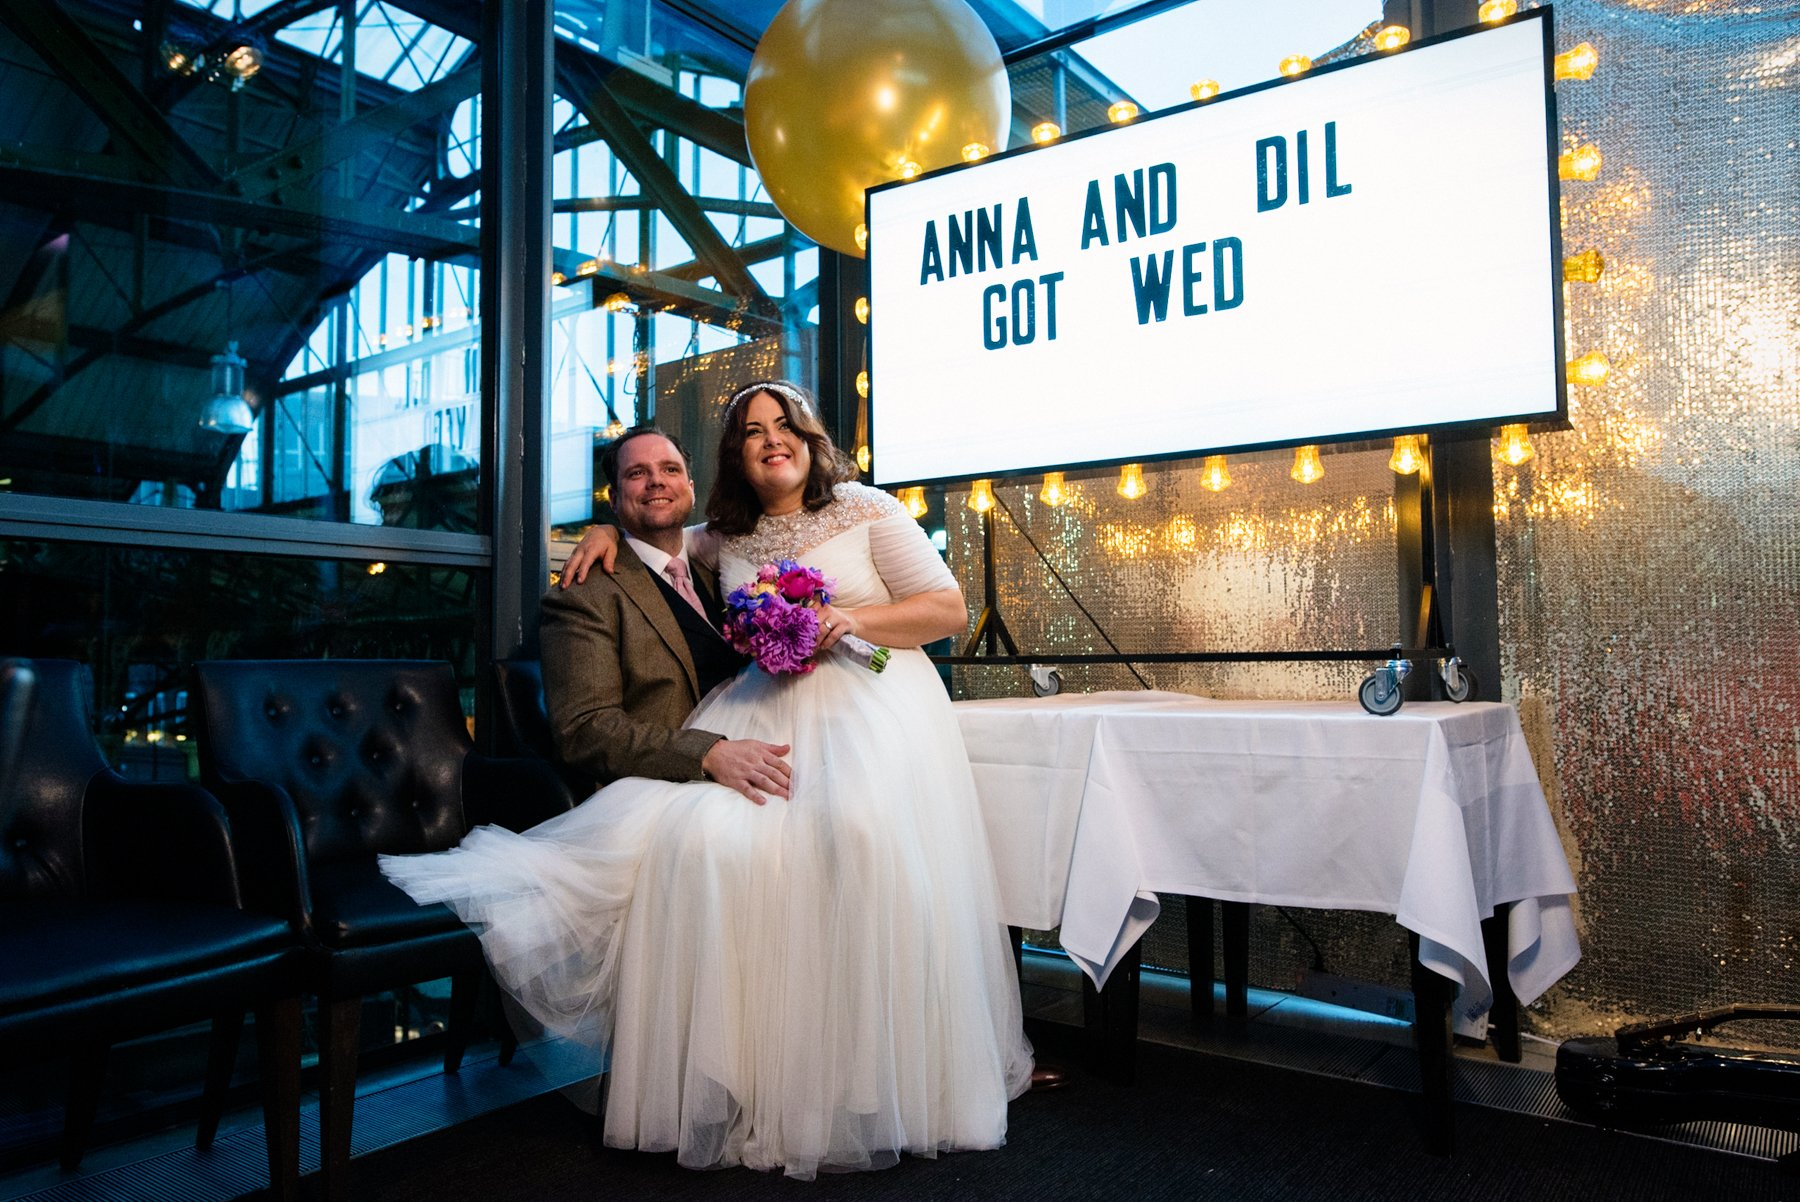 Jenny Packham bride with groom London